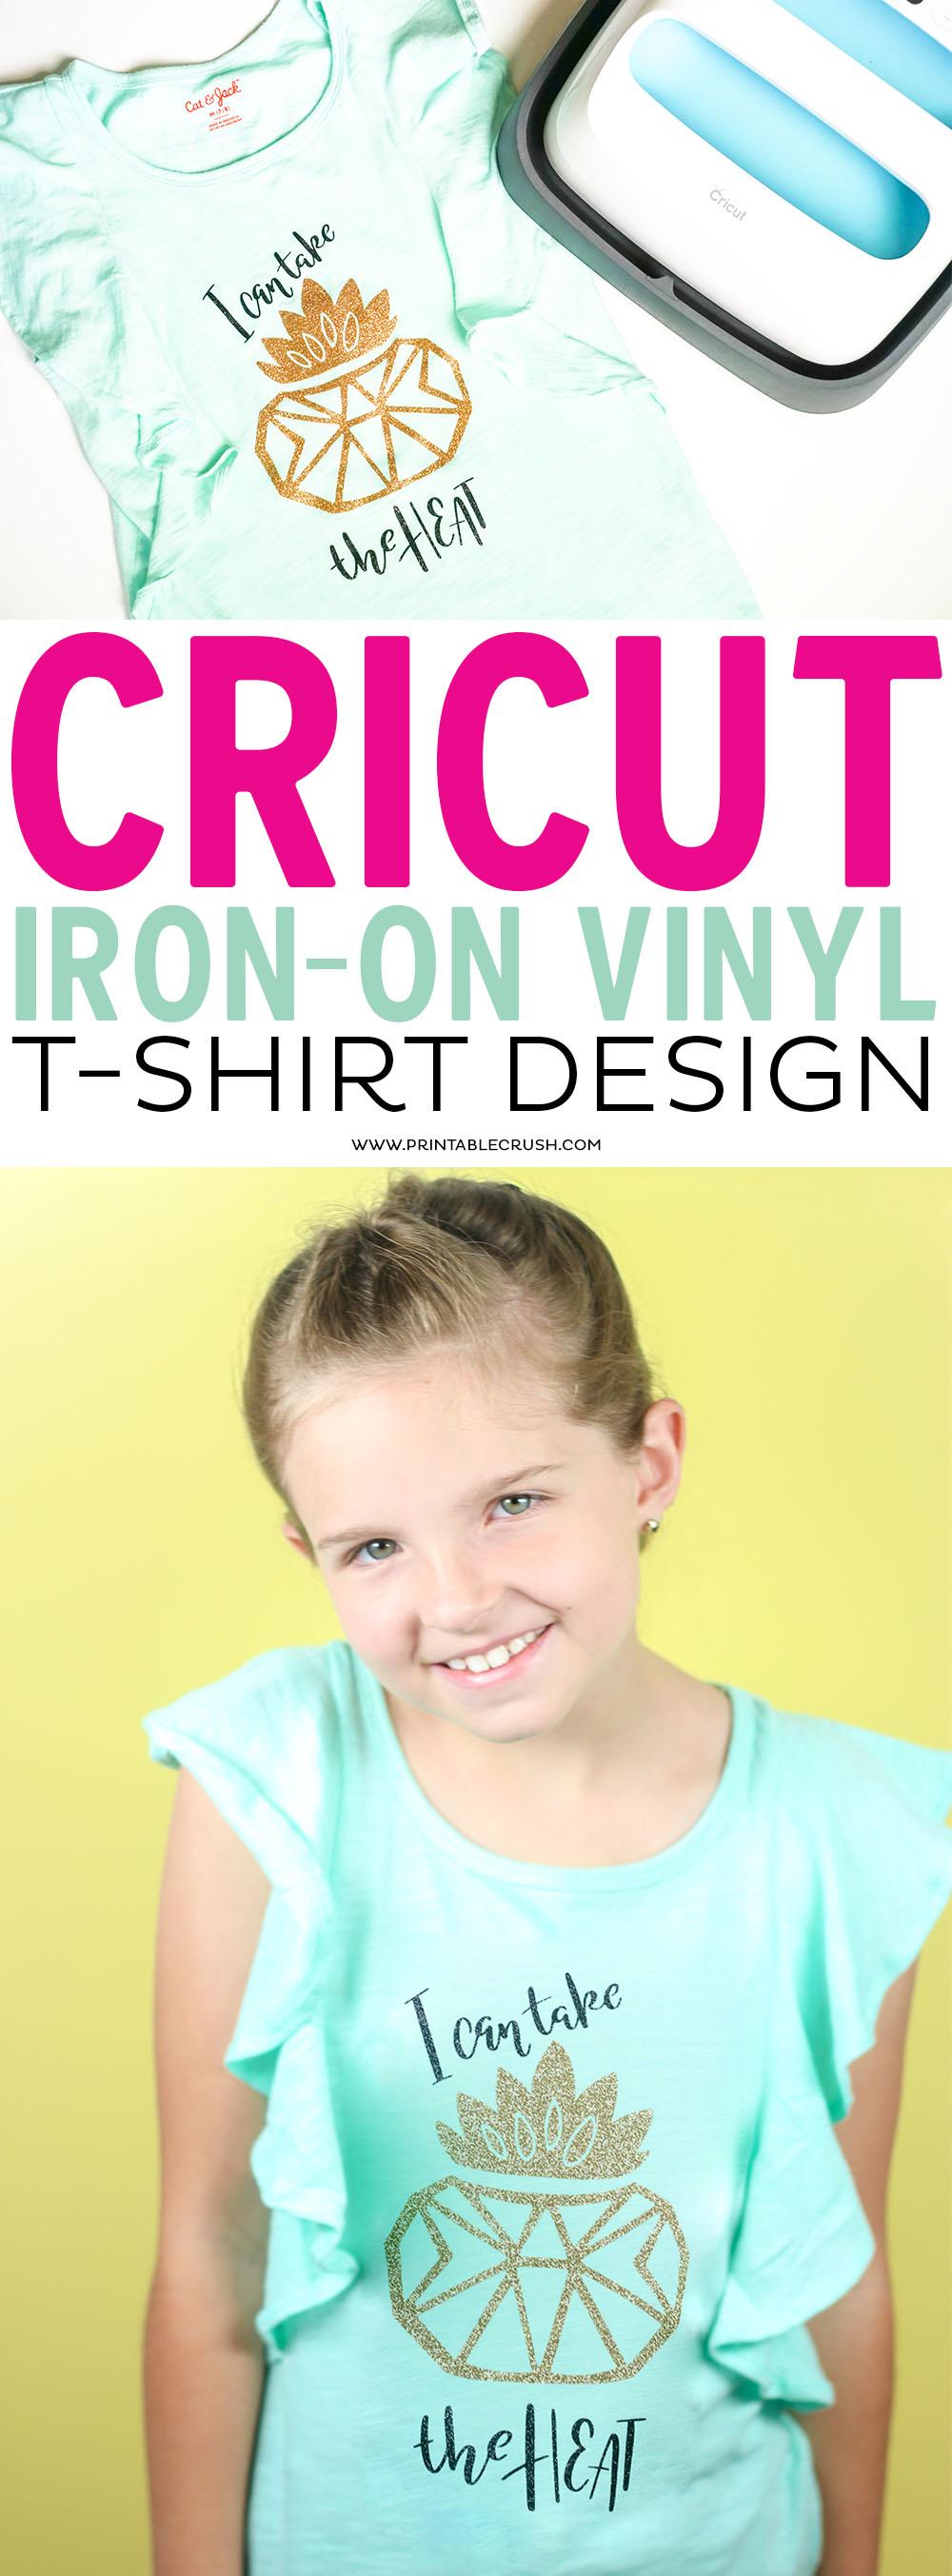 Cricut Iron-On Vinyl Succulent T-shirt Design